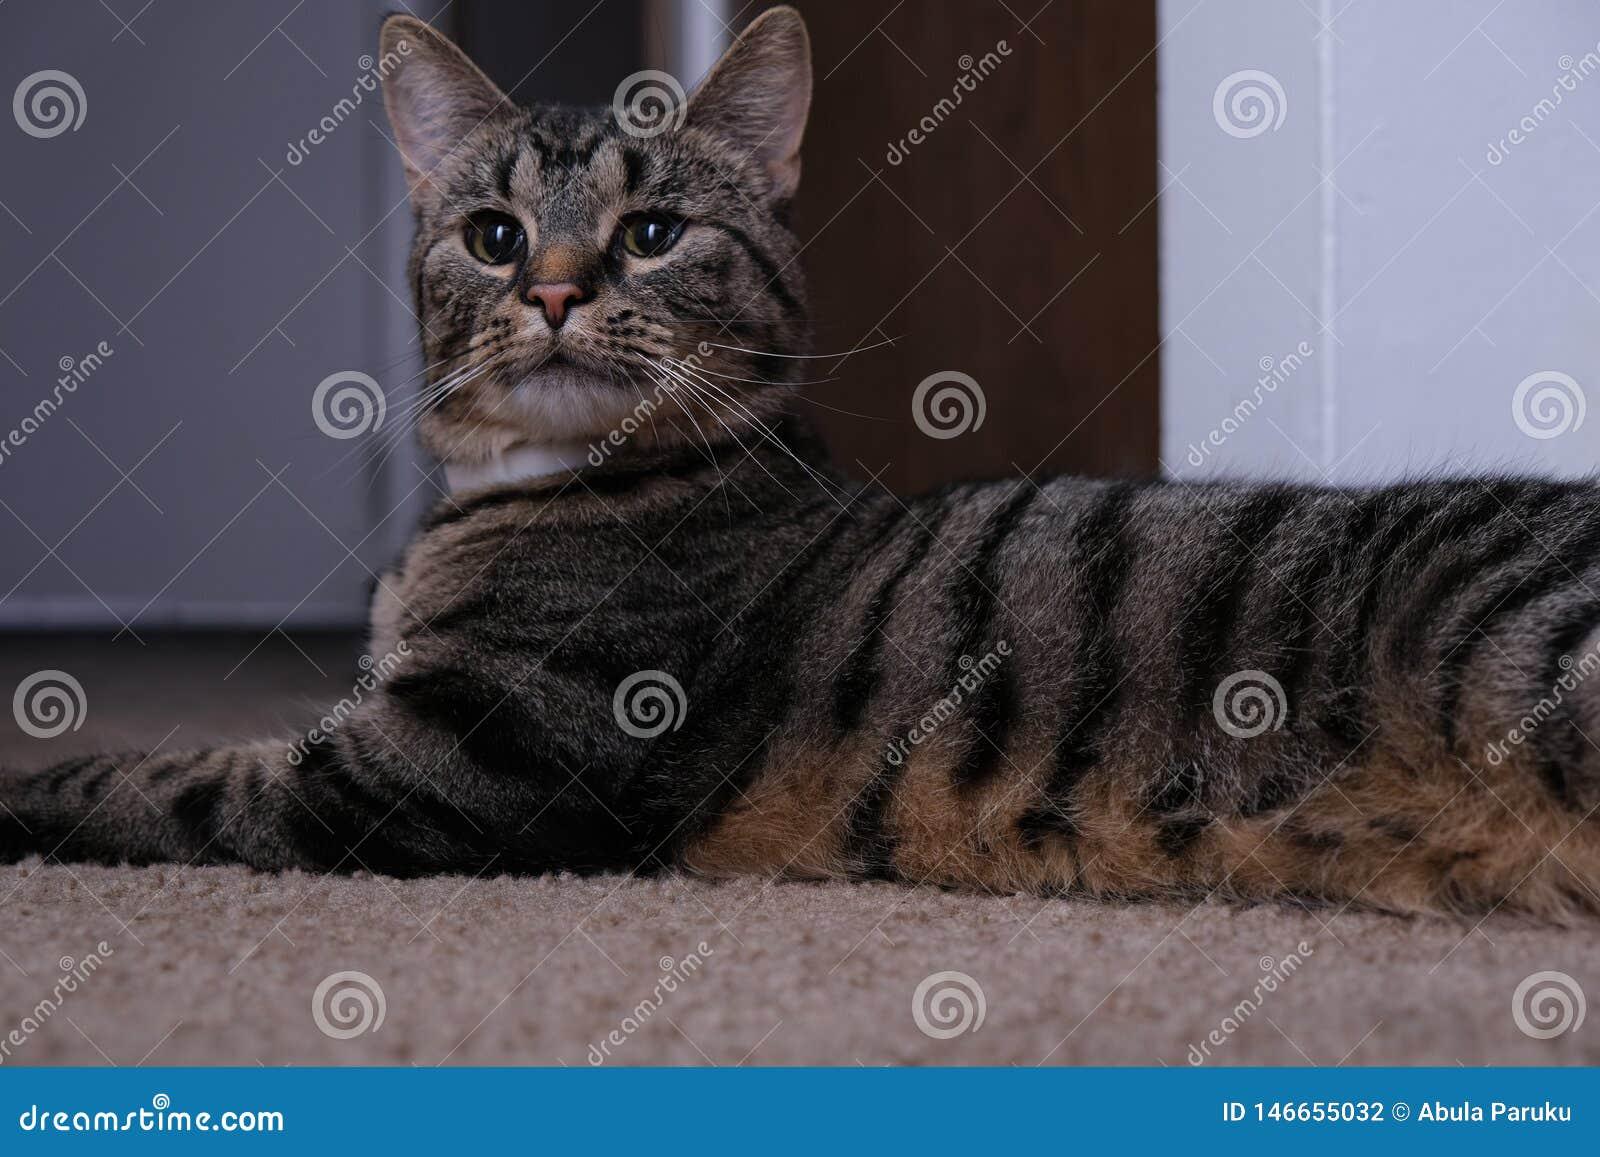 Cat Indoors With Surprised Look linda